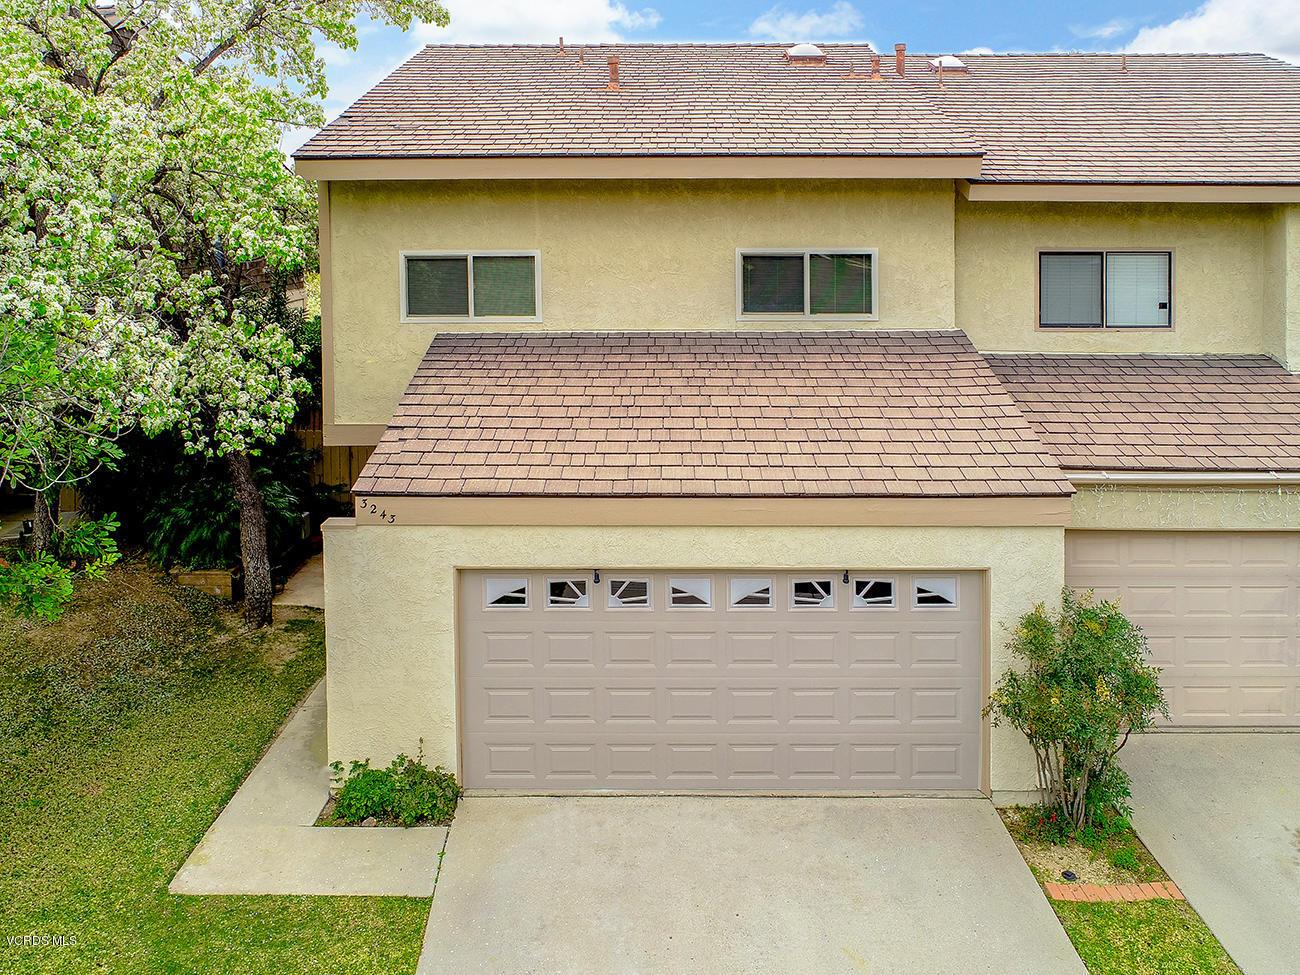 3243 Sunburst Place, Thousand Oaks, CA 91360